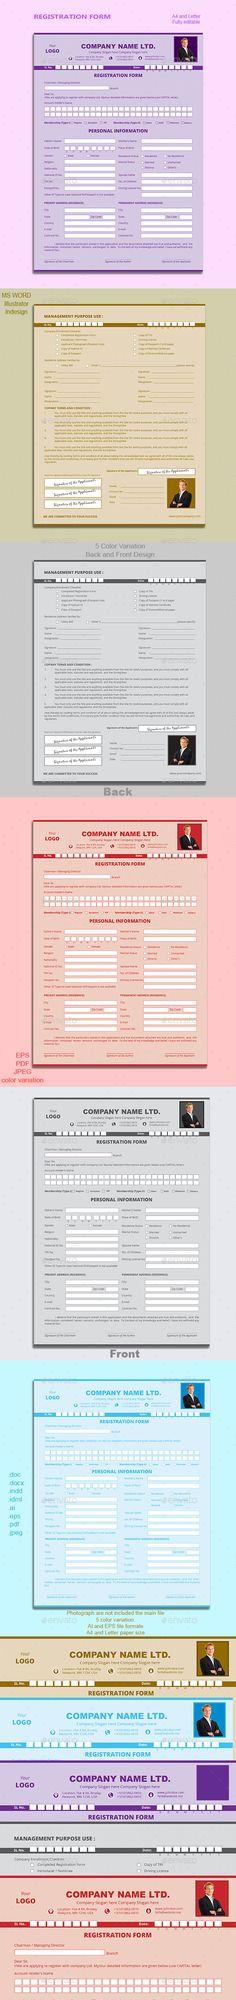 Form - employee registration form